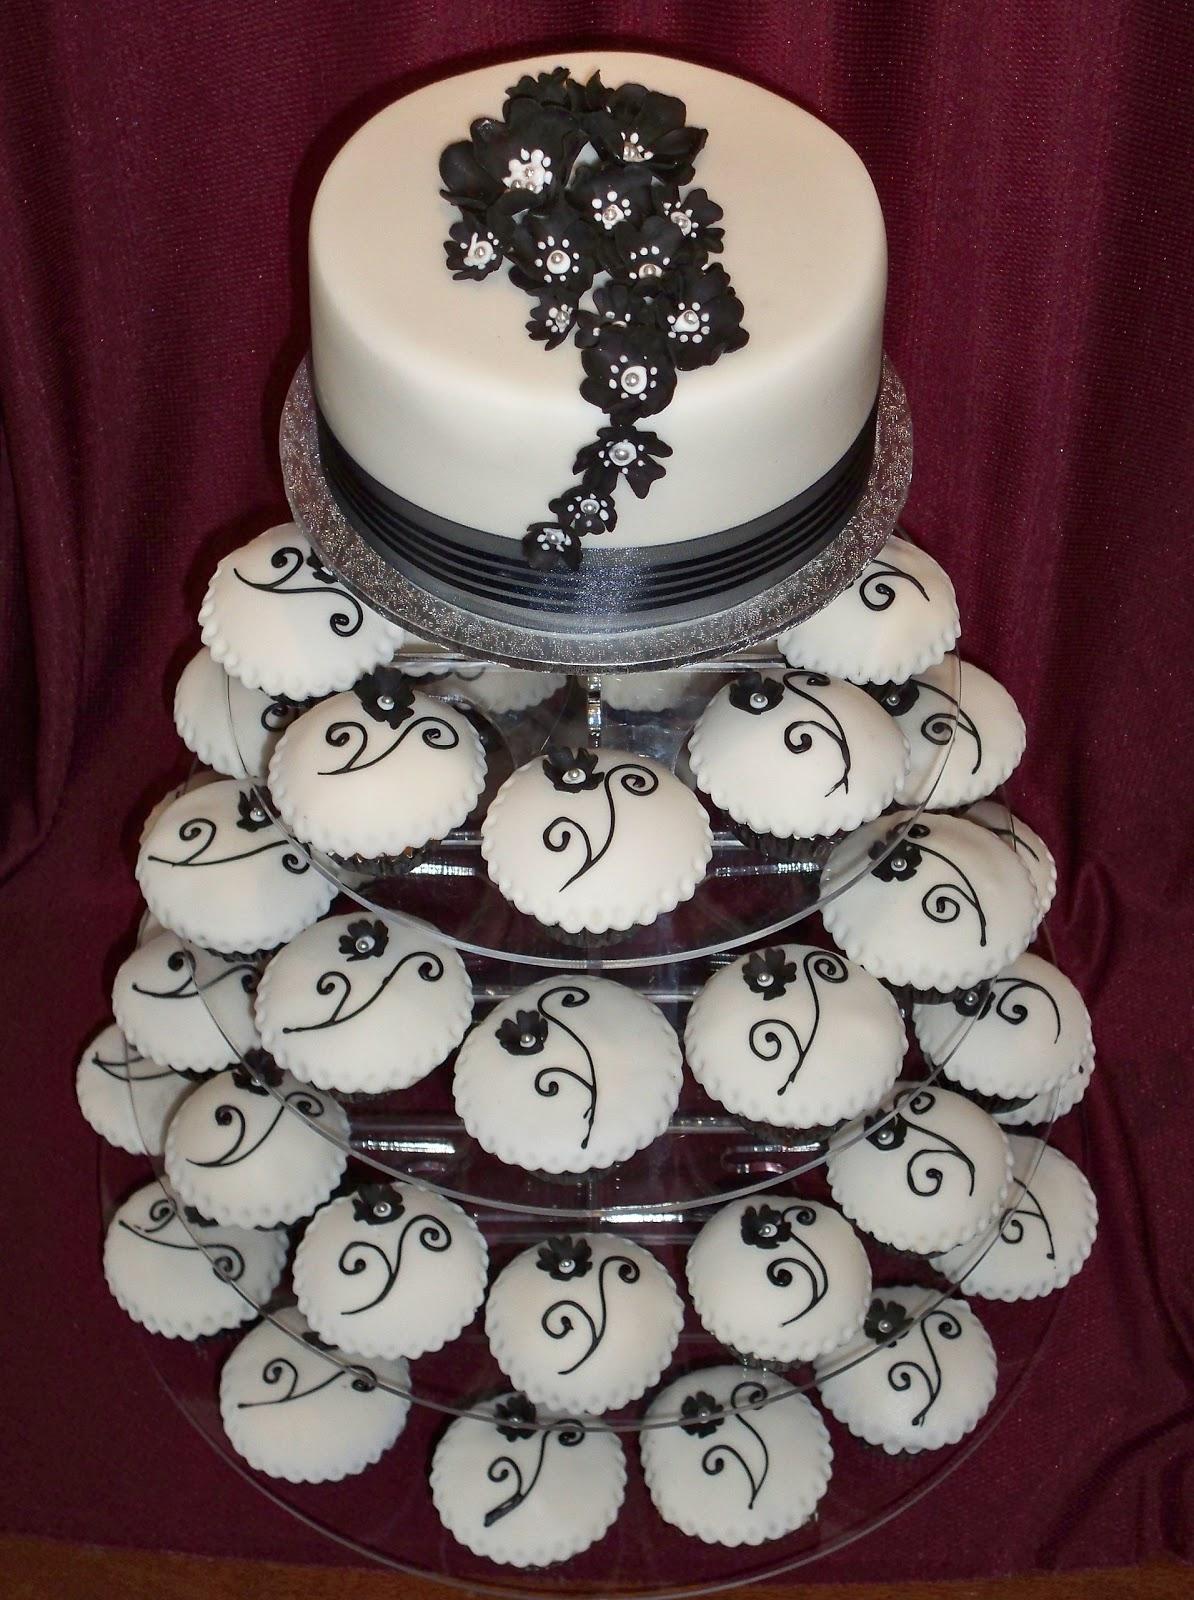 Epper s blog Black & White Wedding Cupcakes black and